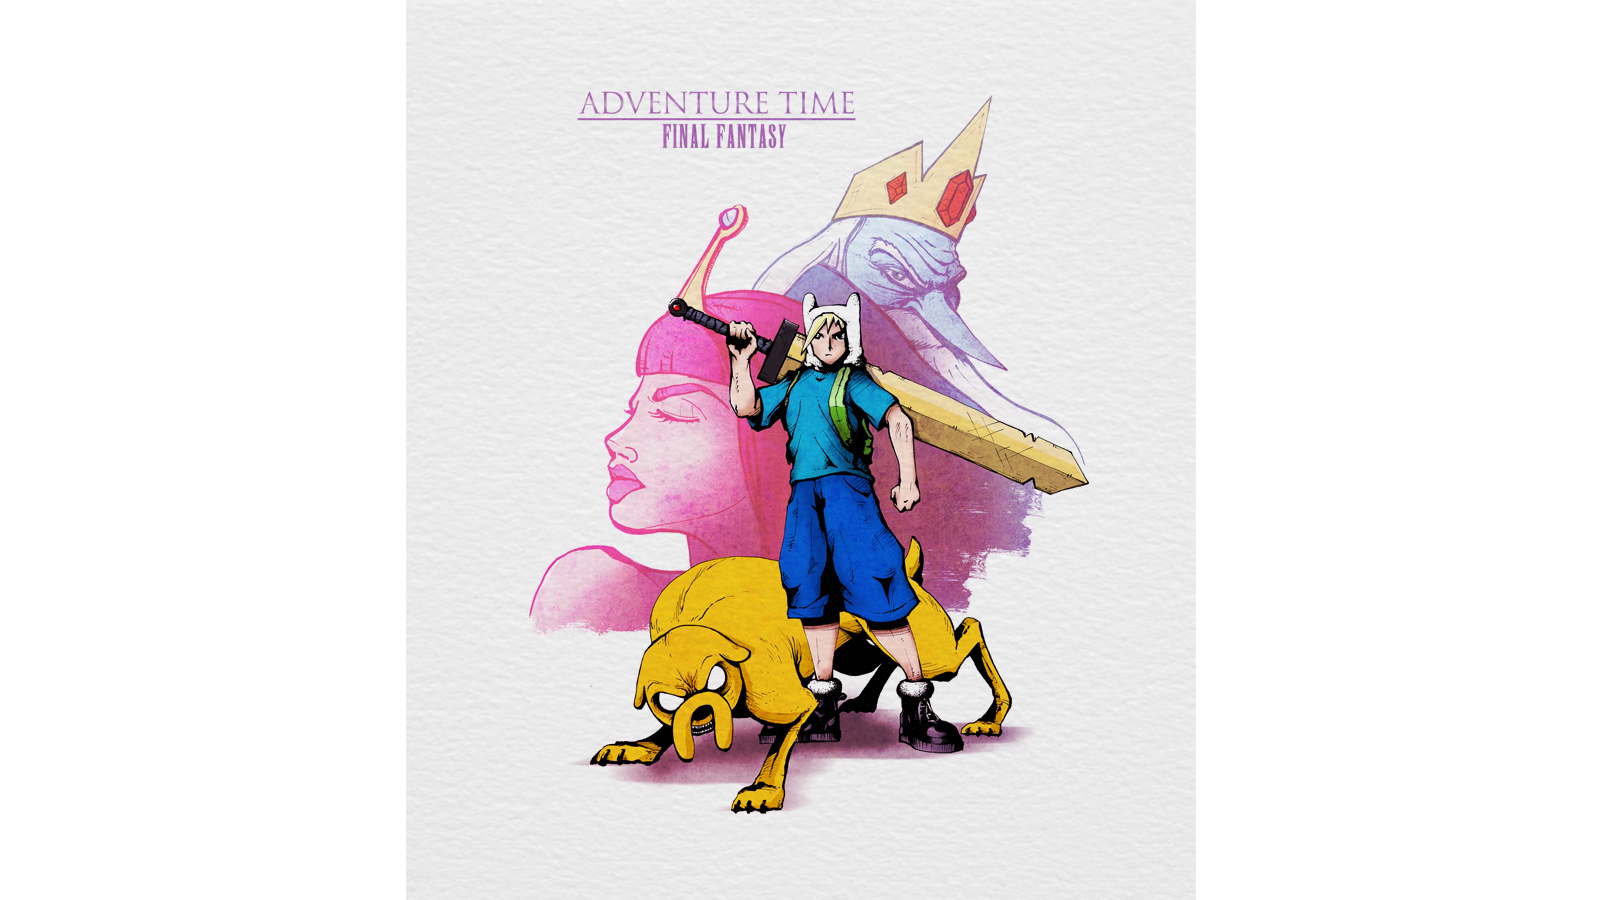 finalfantasy_adventuretime_01.png